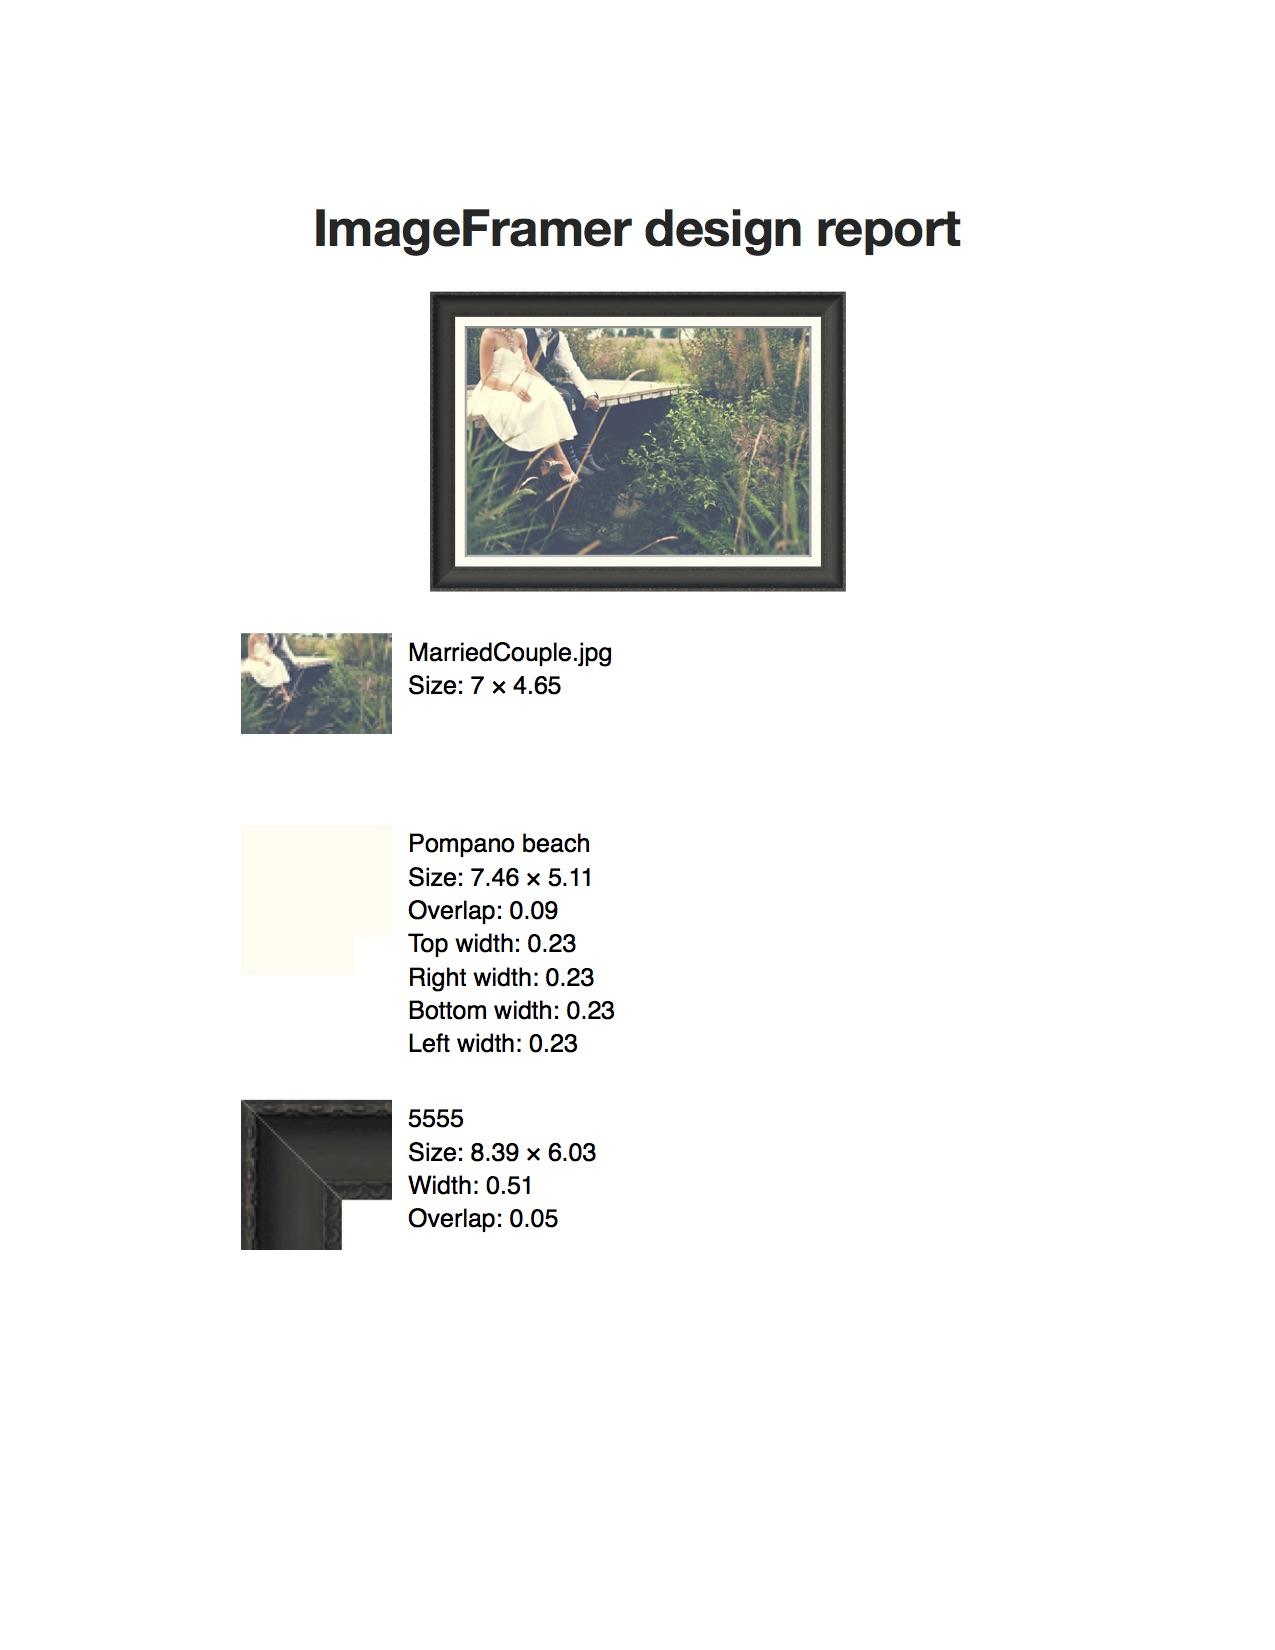 ImageFramer Report